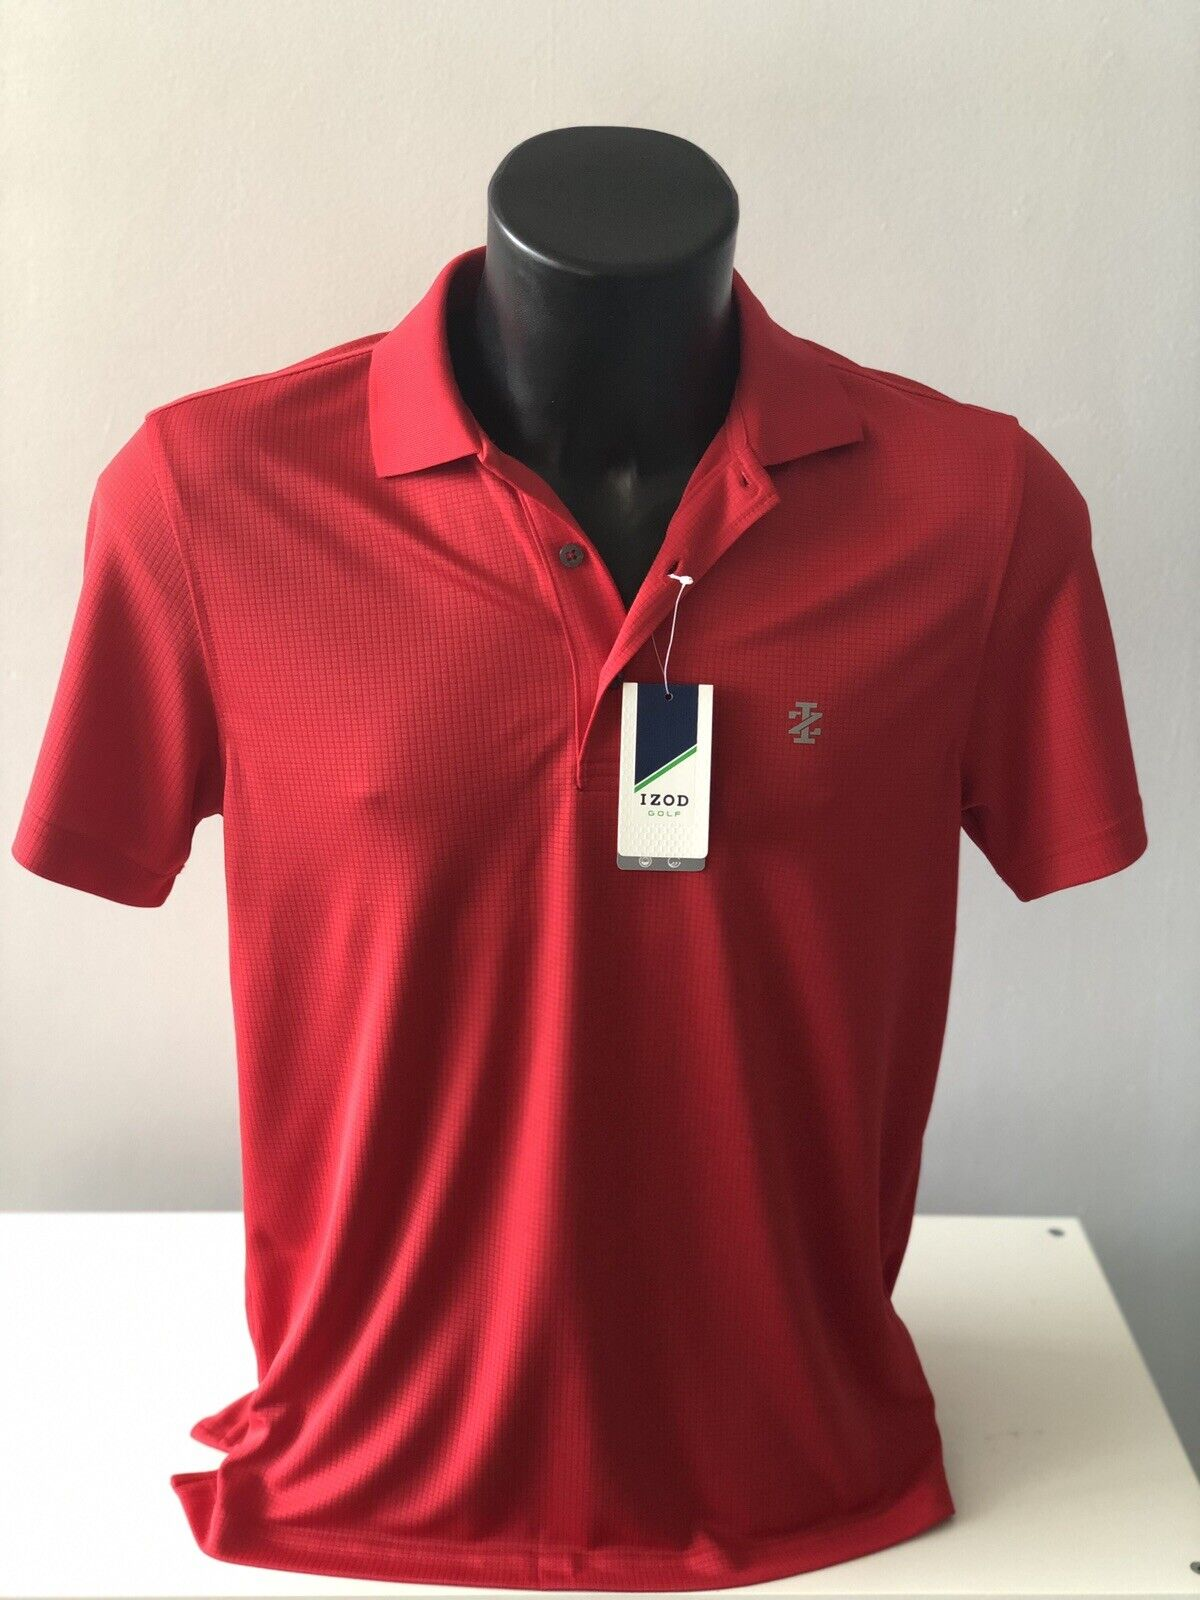 IZOD Men/'s Pink Striped Pique Branded Polo Size L,XL NWT